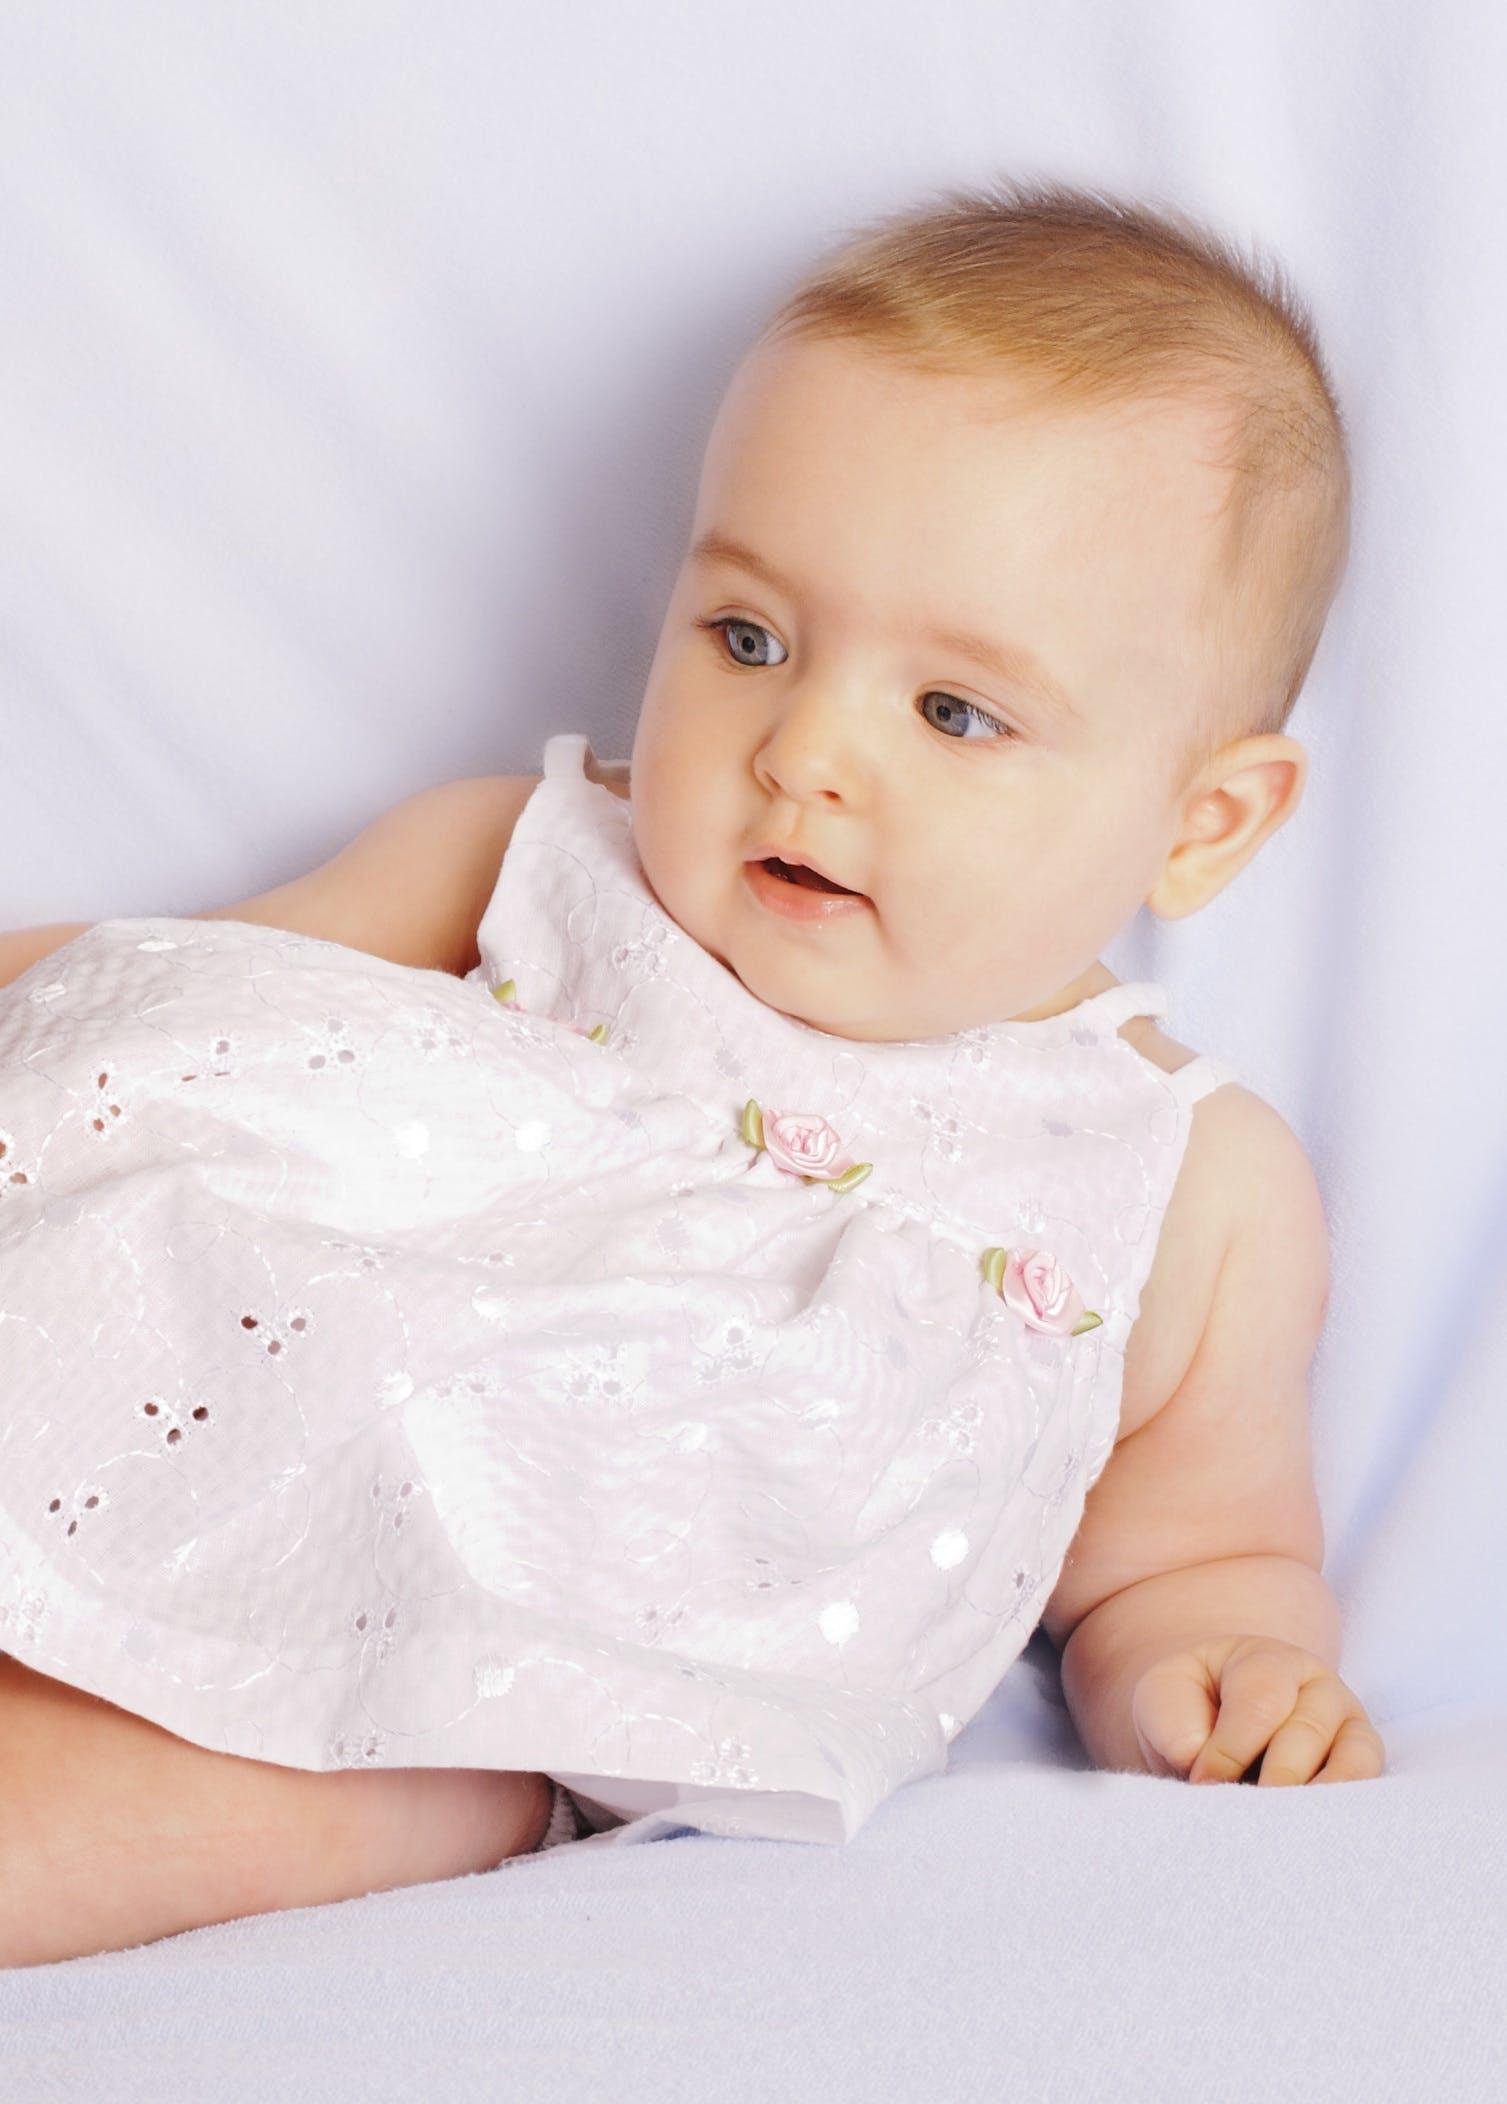 Baby in rosa Kleid | Quelle: Pexels